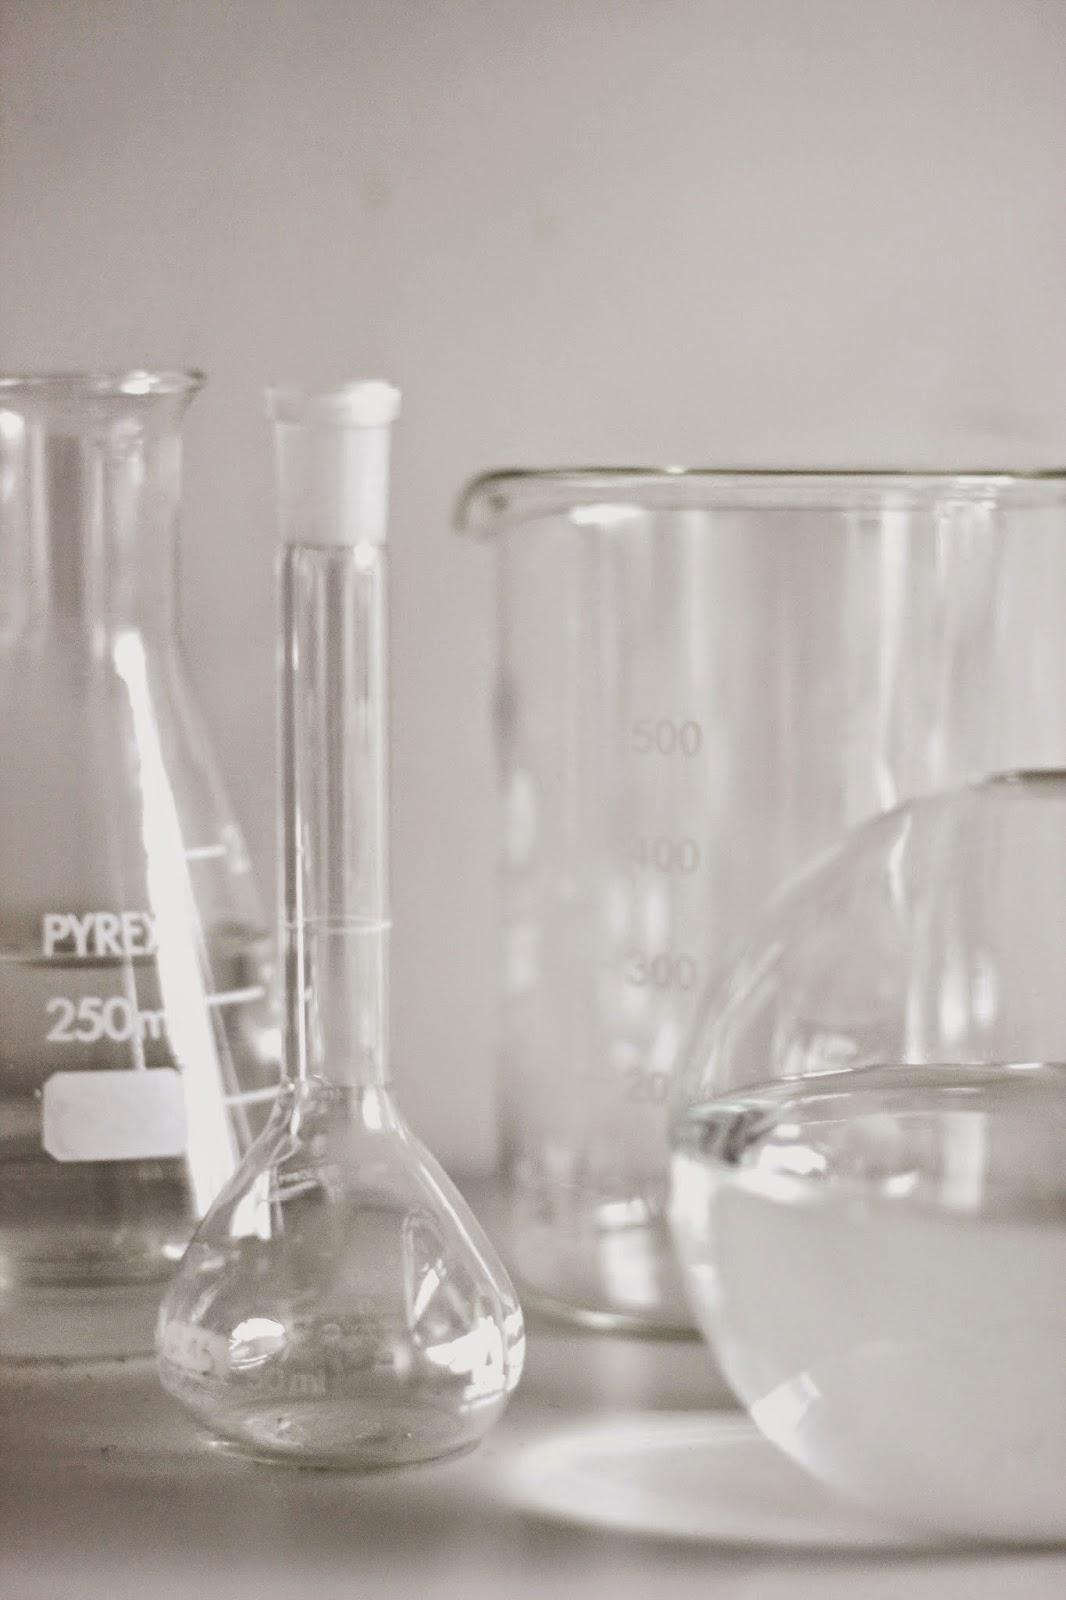 chemistry glasses, scandinavian interior via http://www.scandinavianlovesong.com/